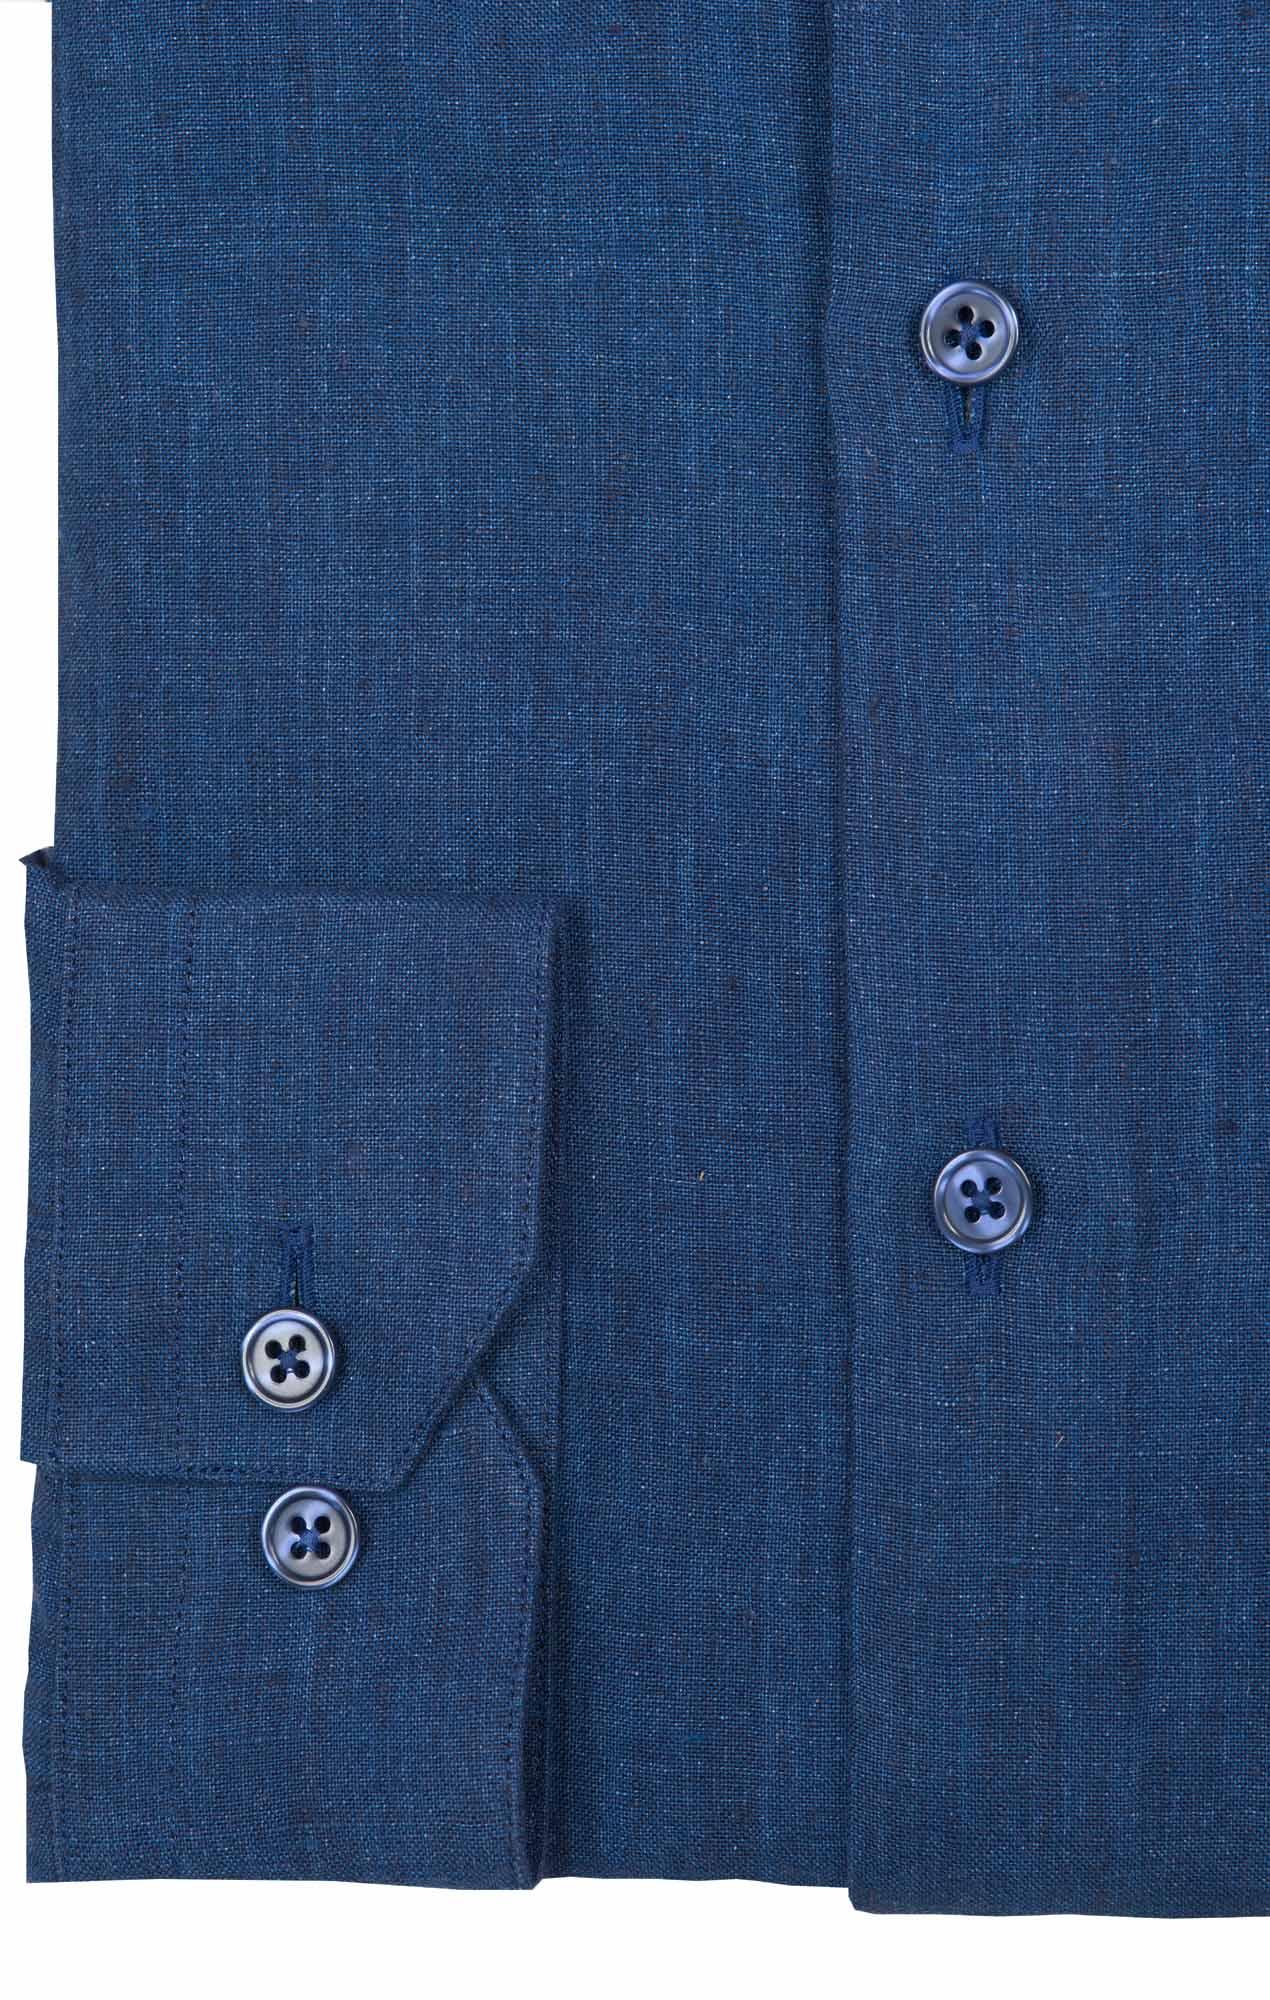 Chemise lin irlandais marine Chemises Hommes